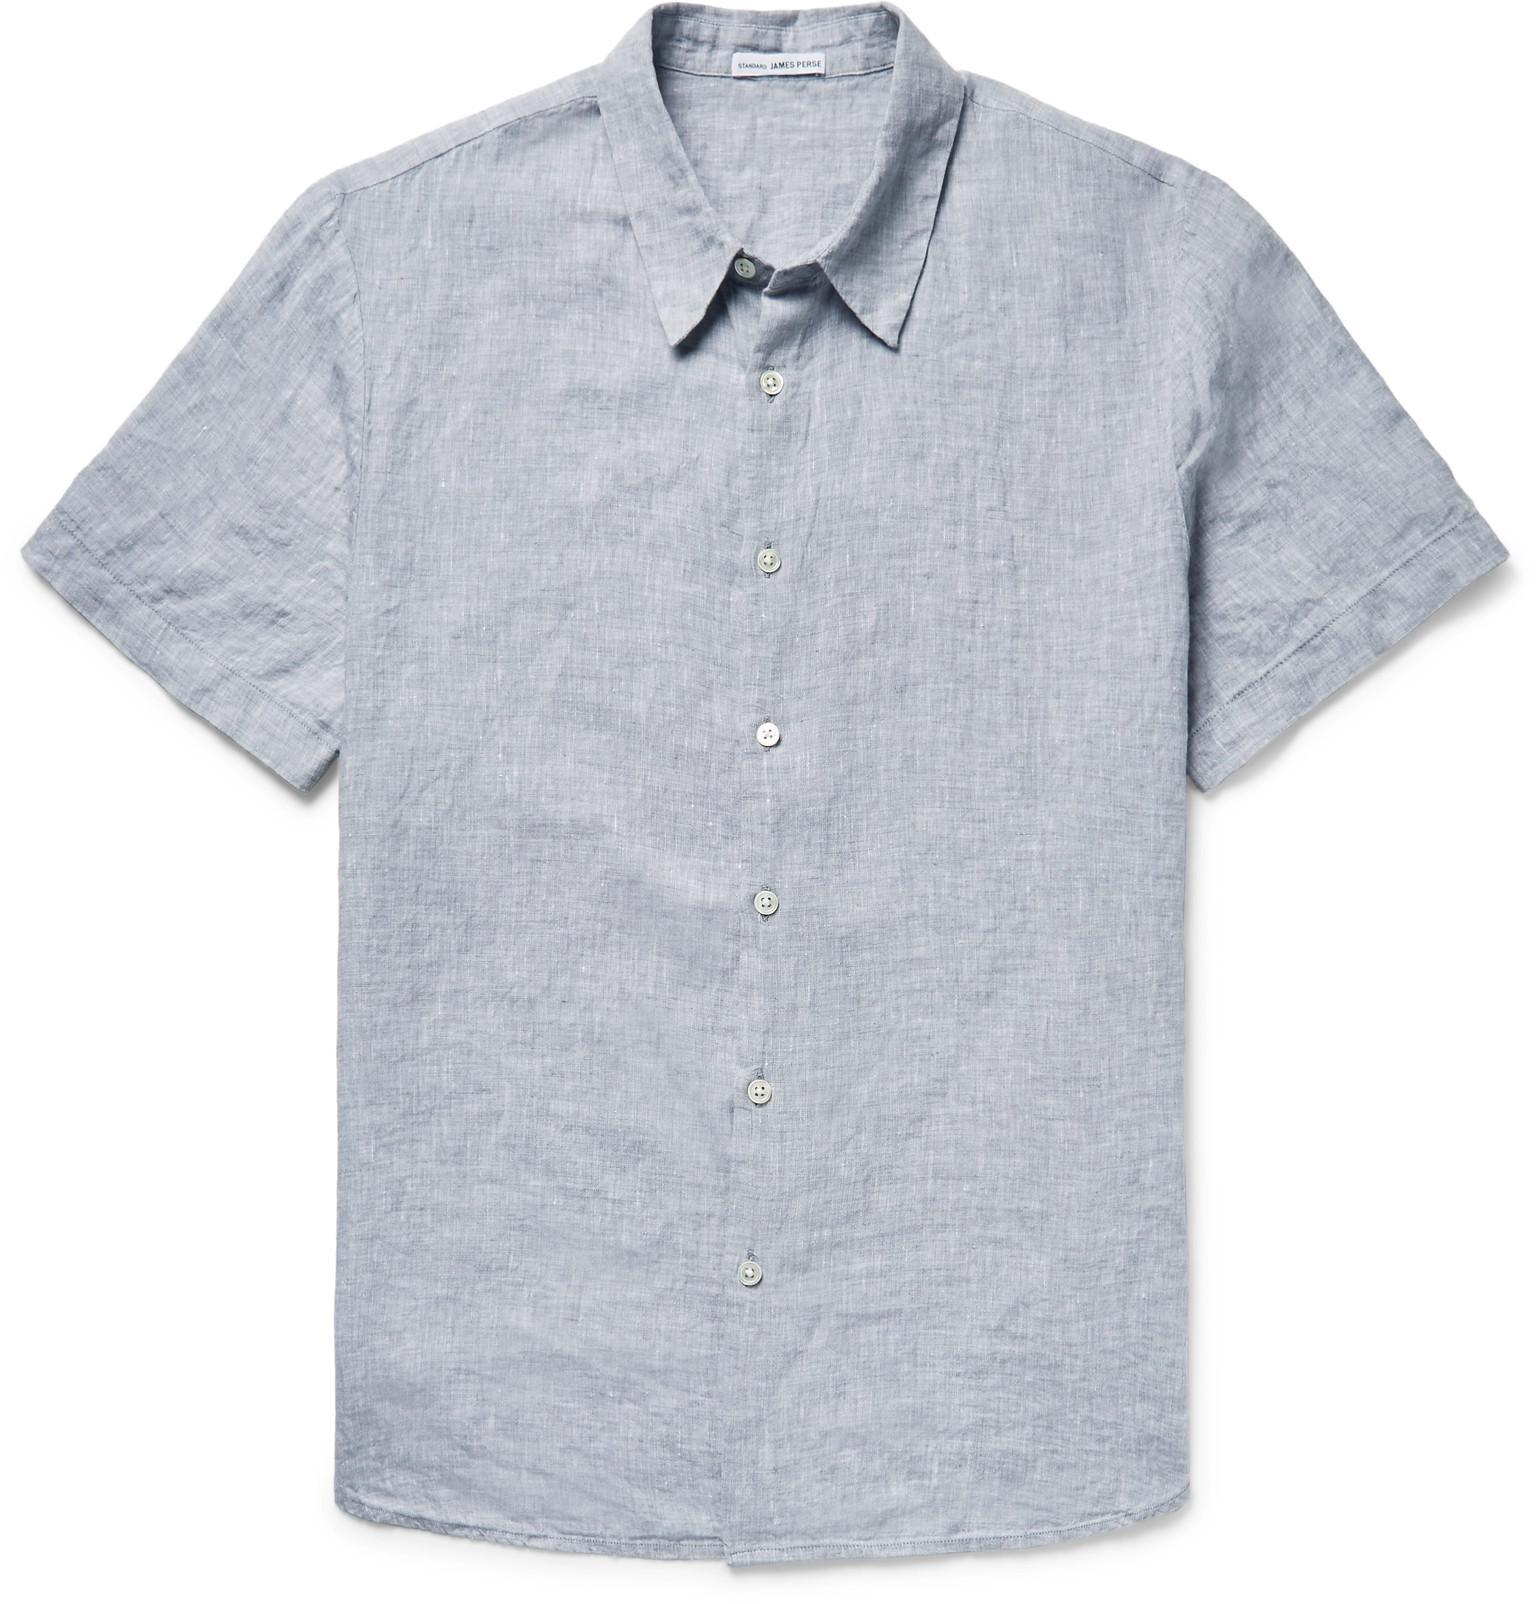 Cheap Marketable Slub Linen Shirt James Perse Buy Cheap Cheap BxXrQs